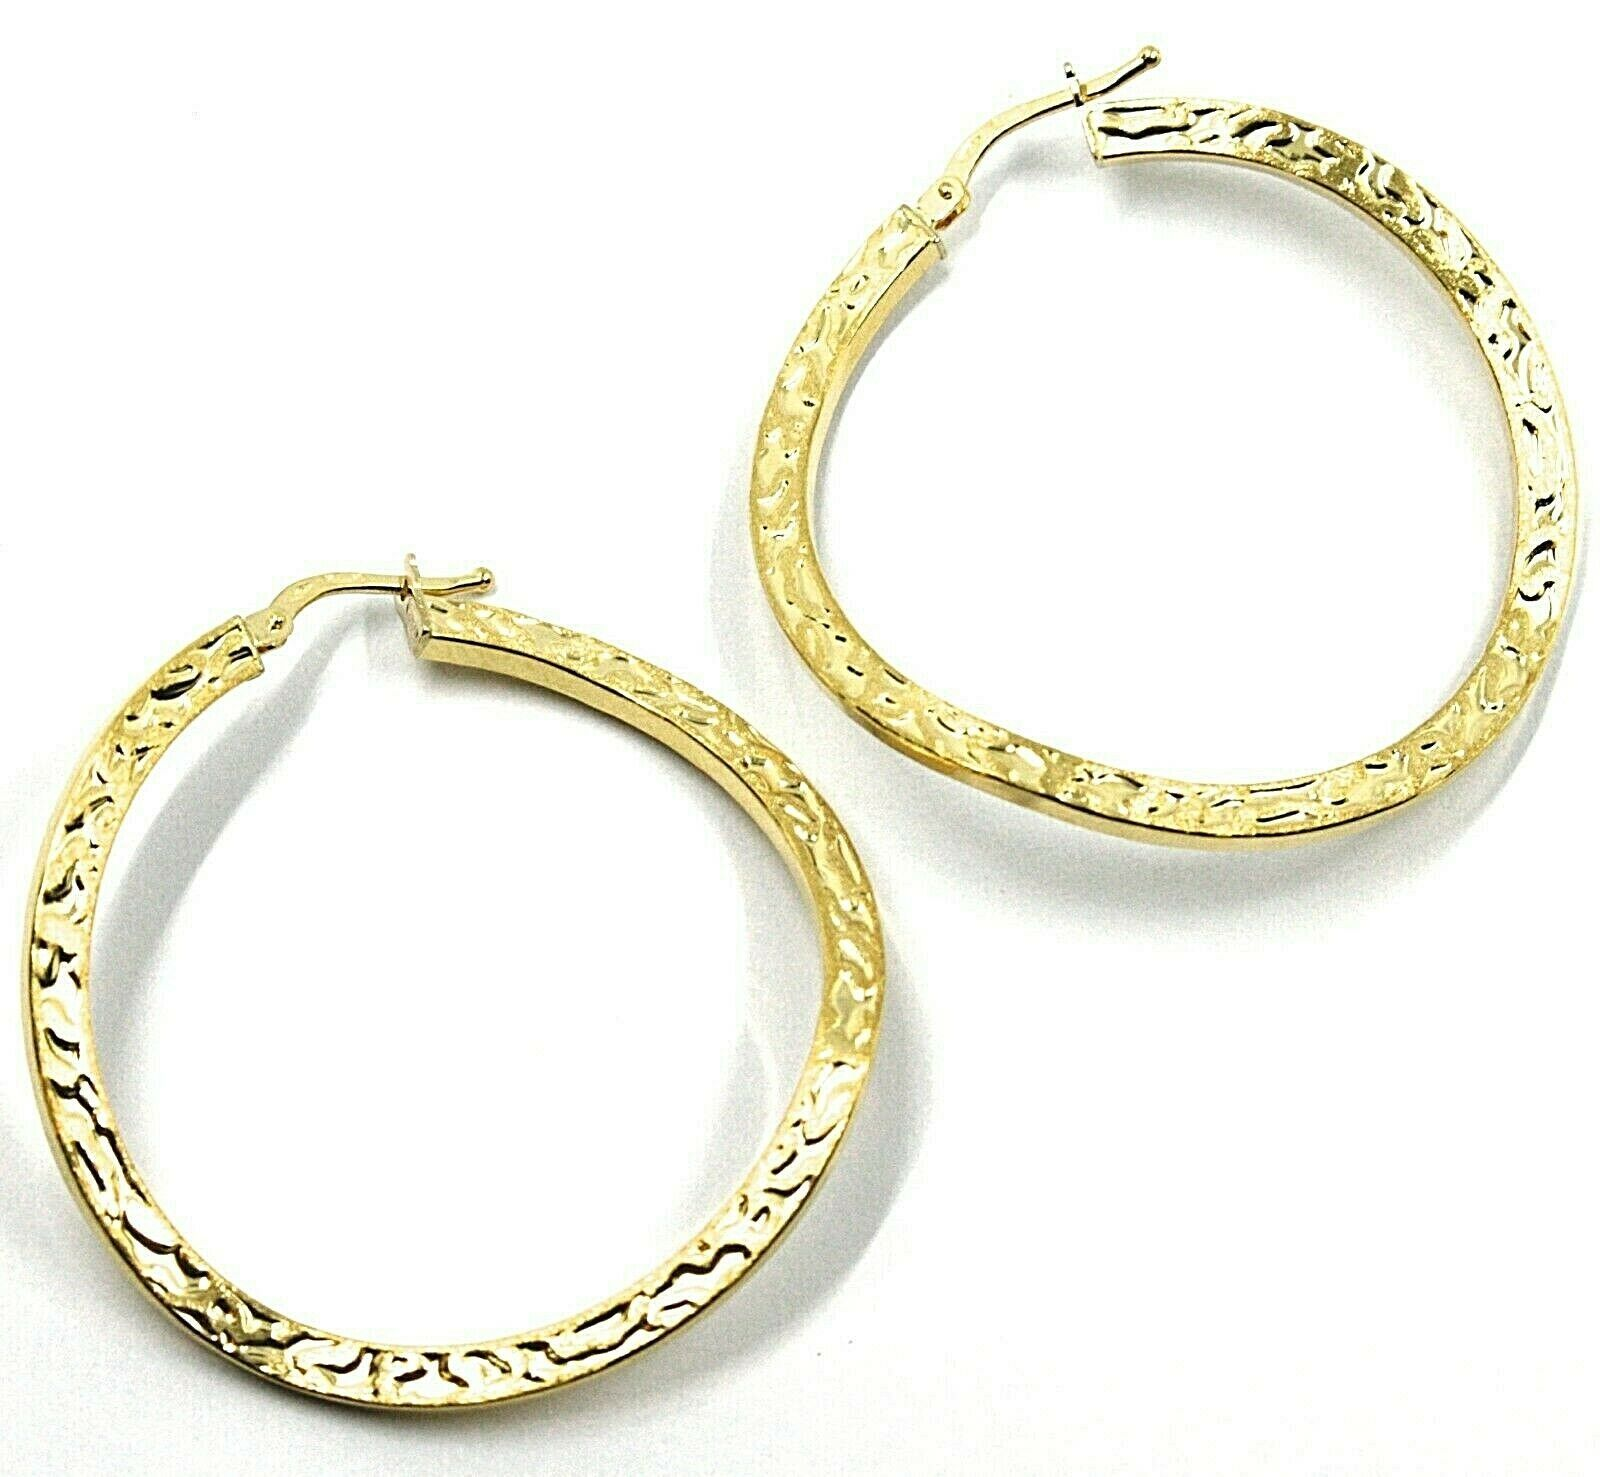 18K YELLOW GOLD CIRCLE HOOPS PENDANT EARRINGS, 4 cm x 2 mm WORKED & ONDULATE